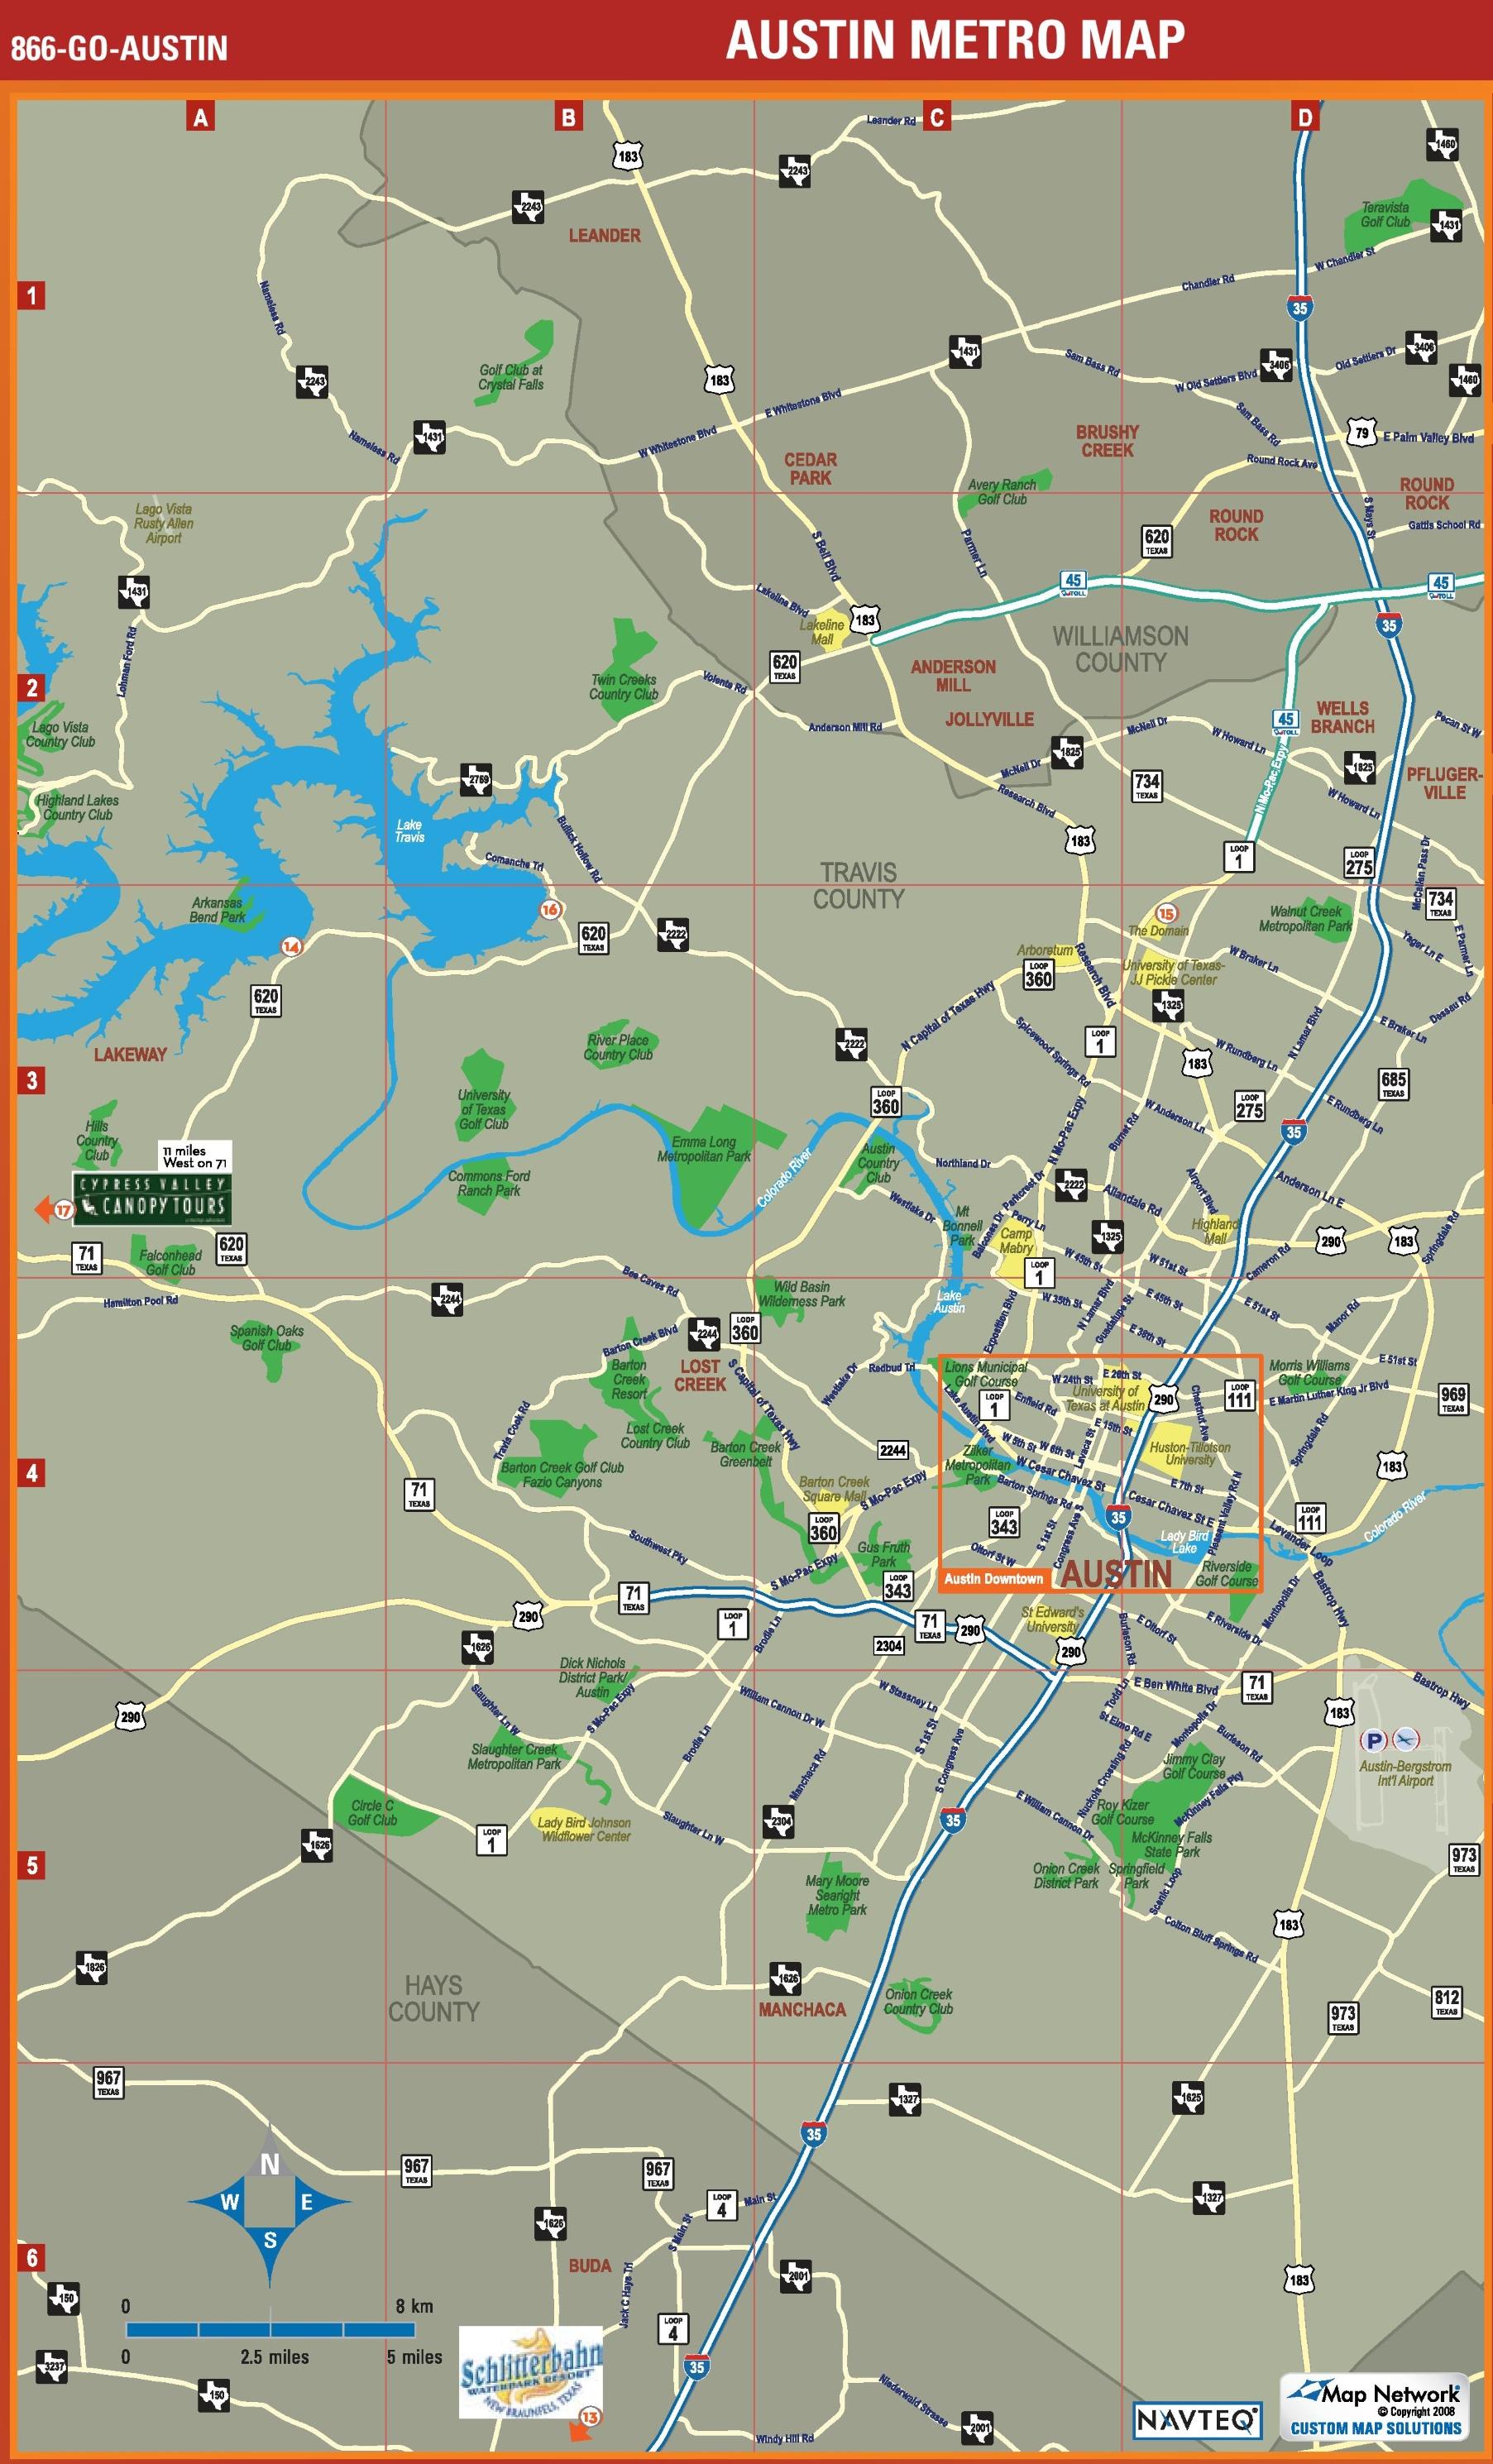 Austin Metro Area Map - Austin metro area map